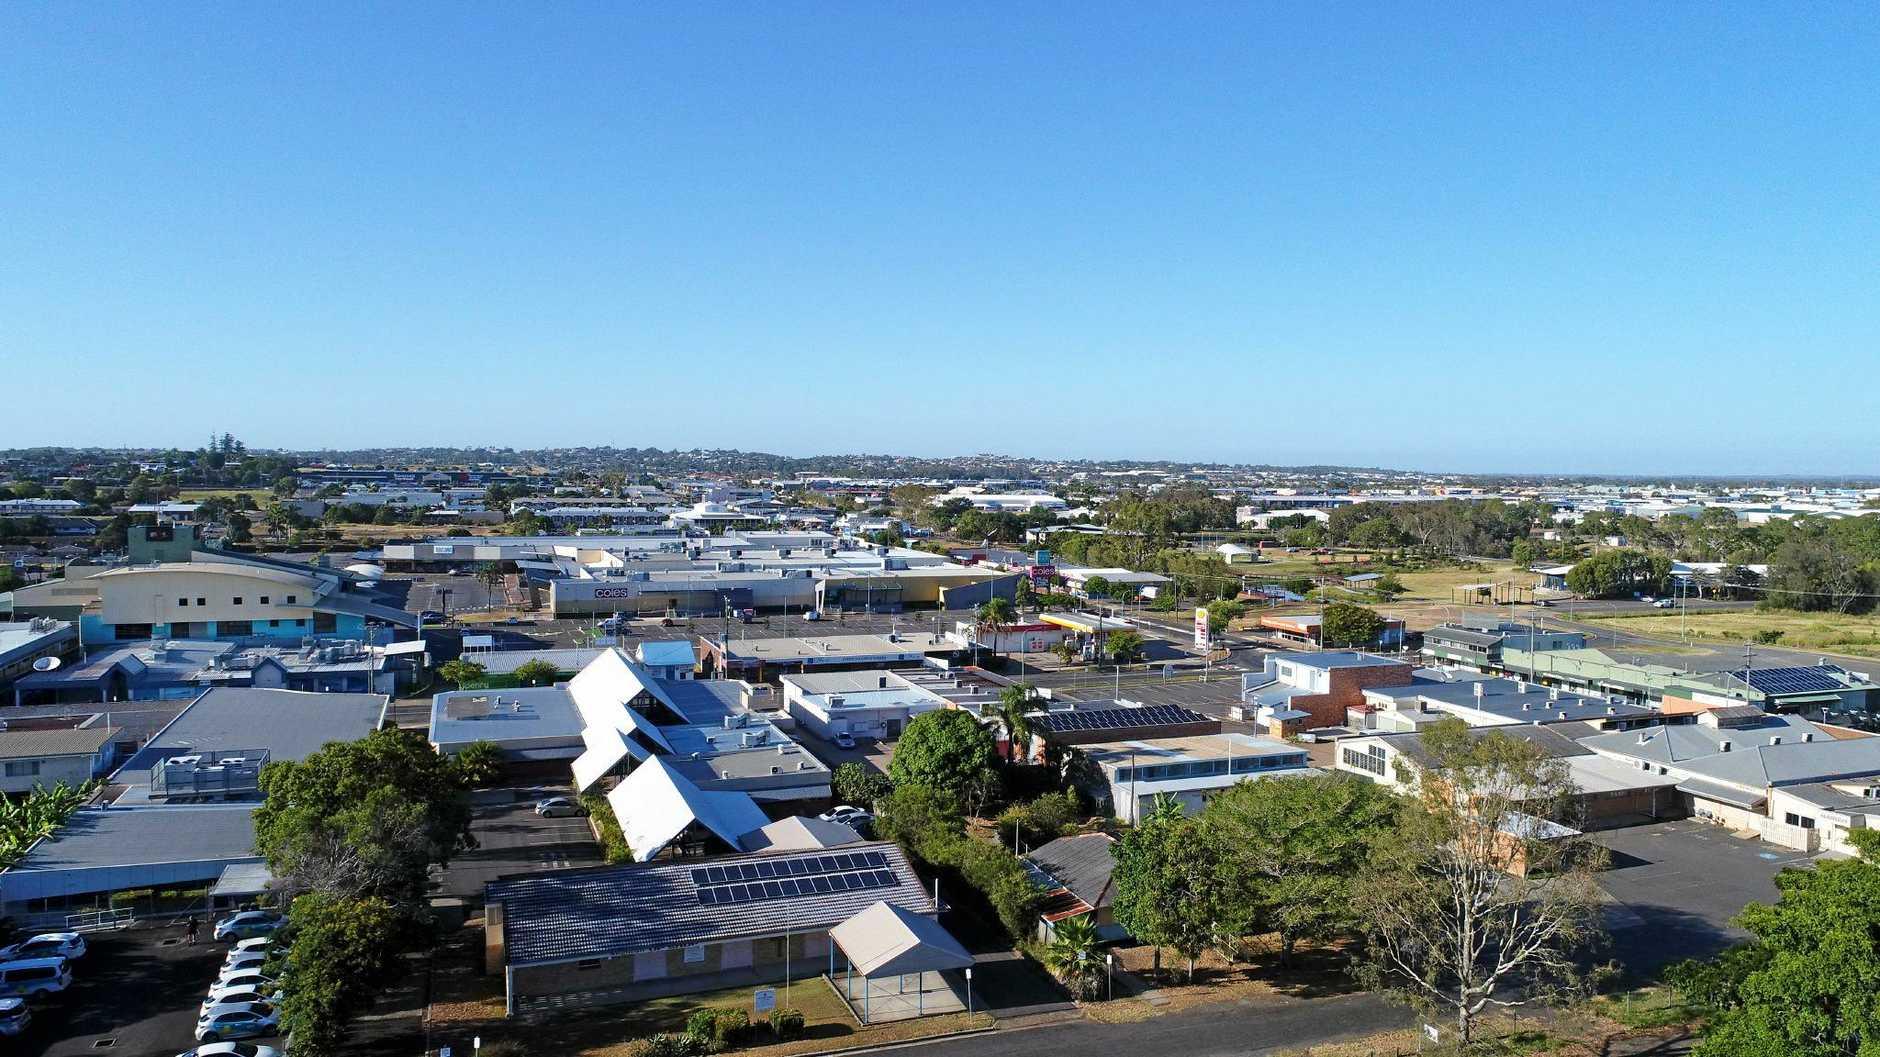 Aerial views of Hervey Bay.